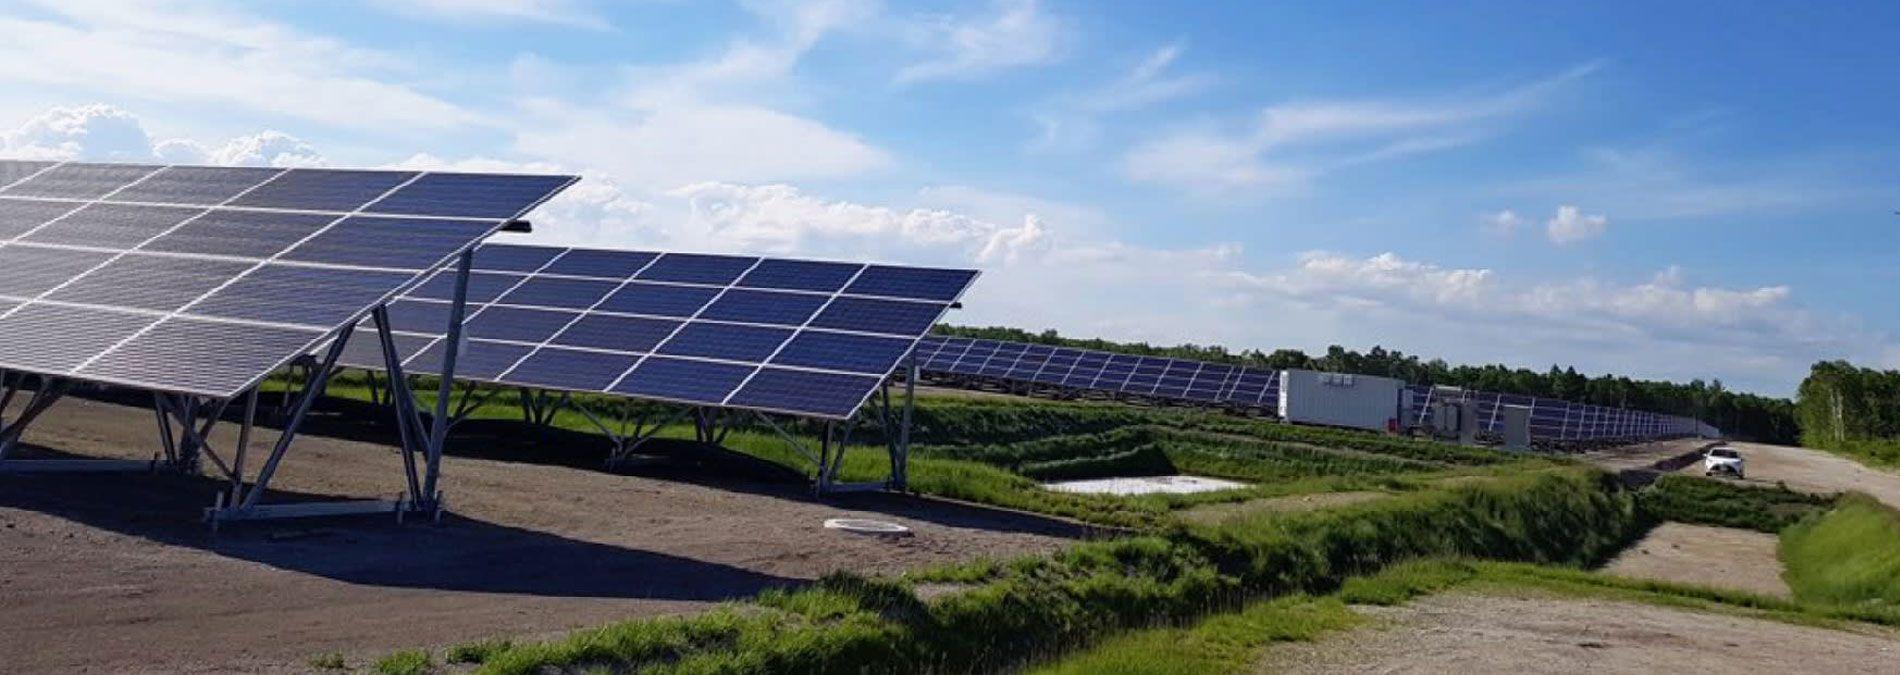 Renewable Energy Sources Renewablenergysolar Solar House Plans Passive Solar House Plans Solar Power House